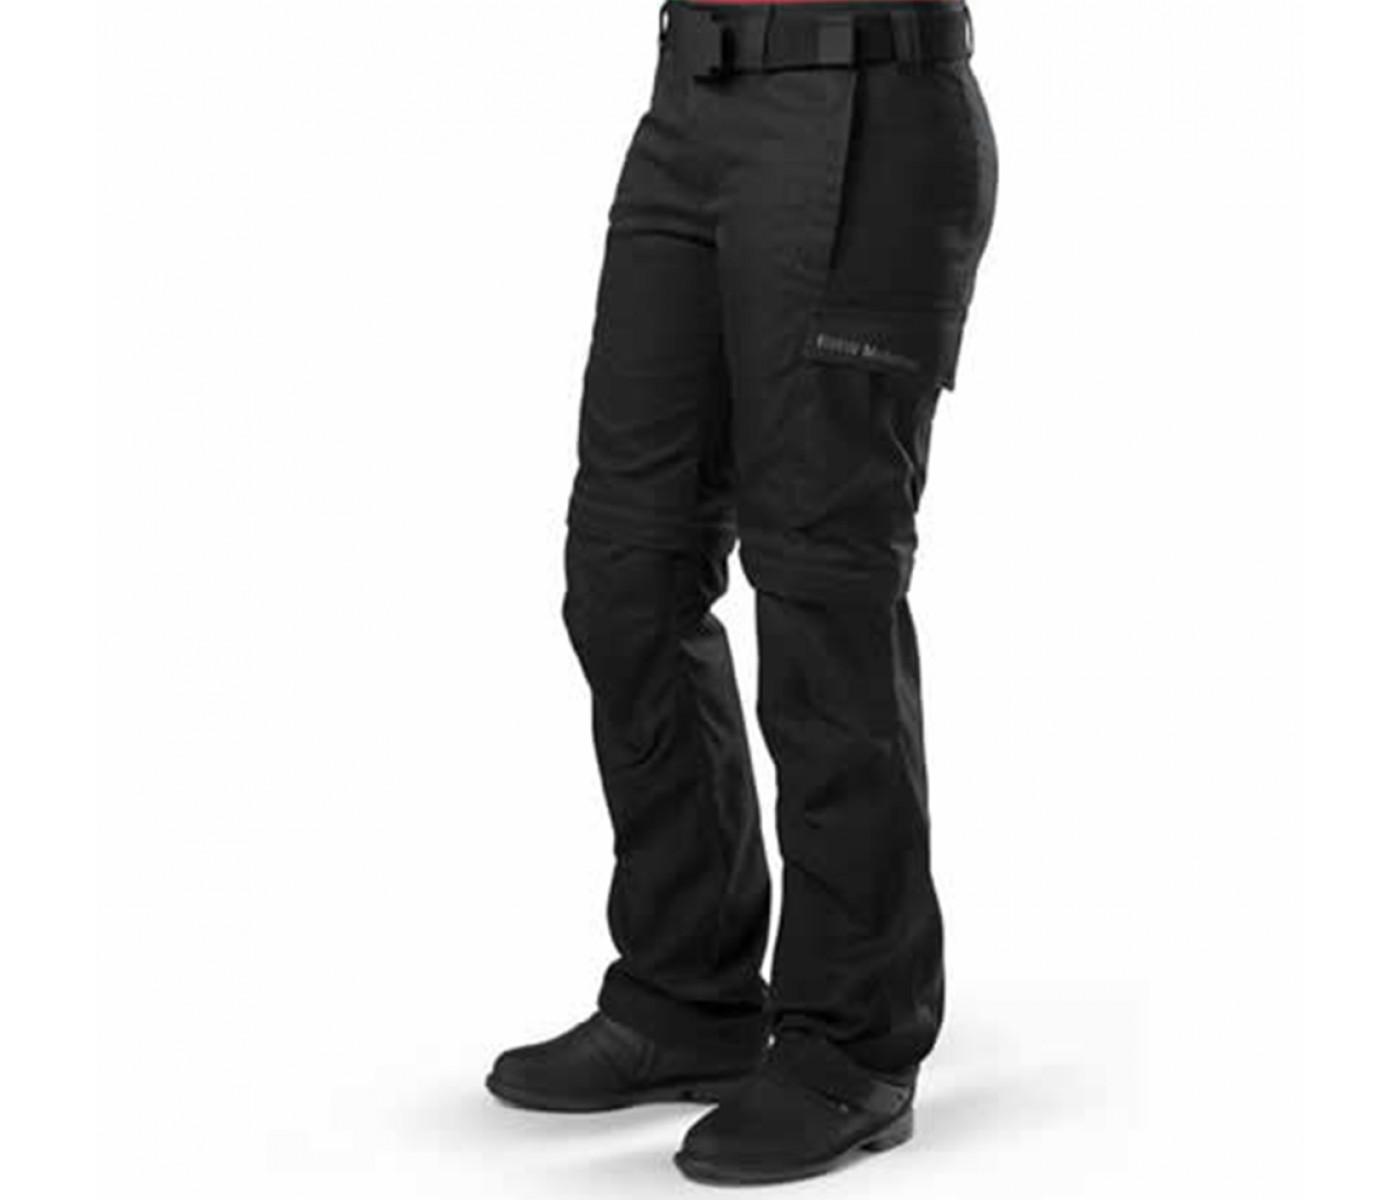 44c59b2725c6 -8% BMW Motorrad Παντελόνι Summer Trousers Unisex Μαύρο ΕΝΔΥΣΗ